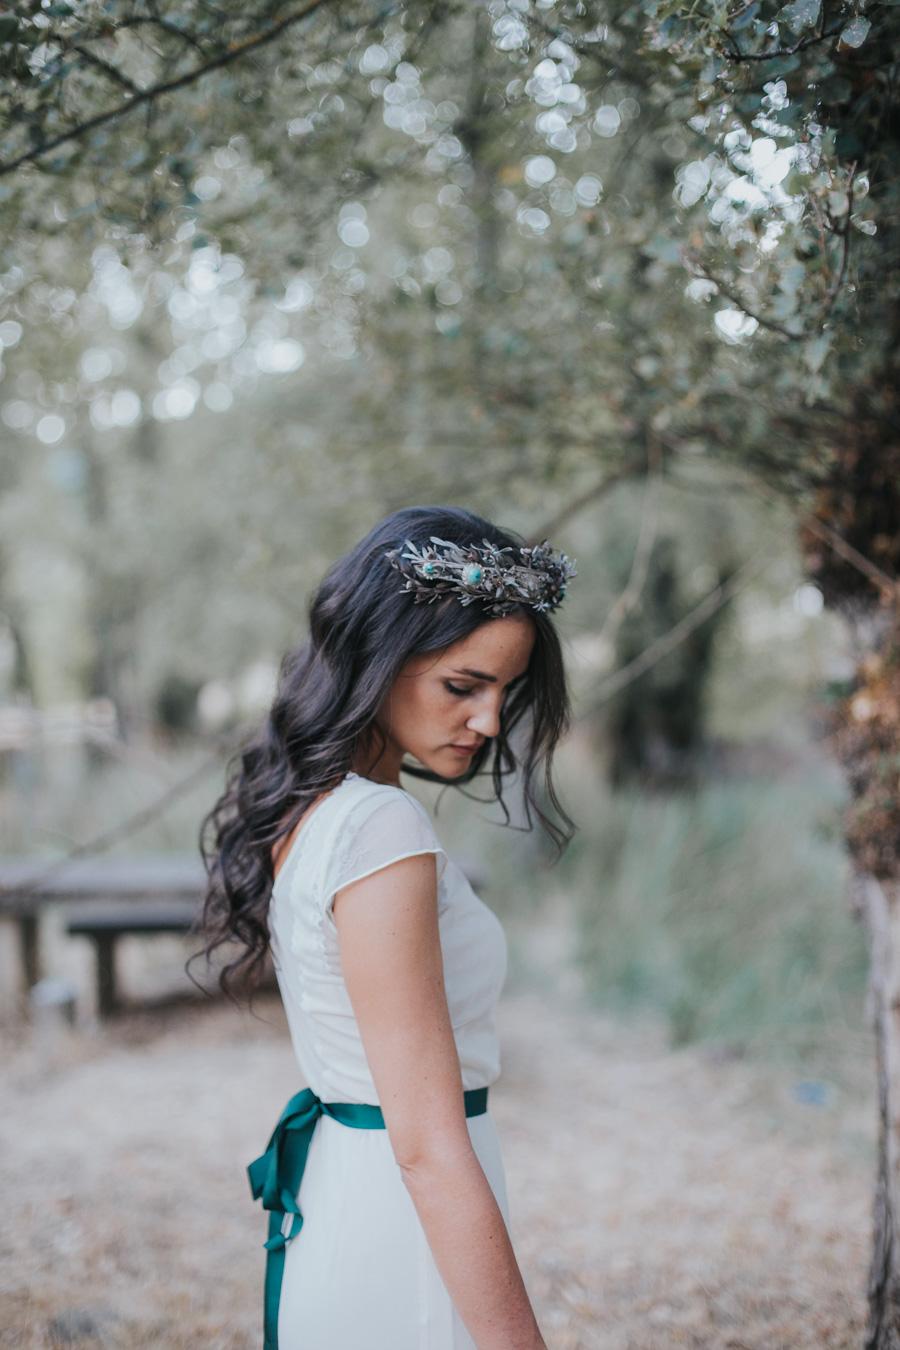 calista-one-lista-de-bodas-online-blog-de-bodas-bodas-con-estilo-vestido-novia-elena-mareque-20